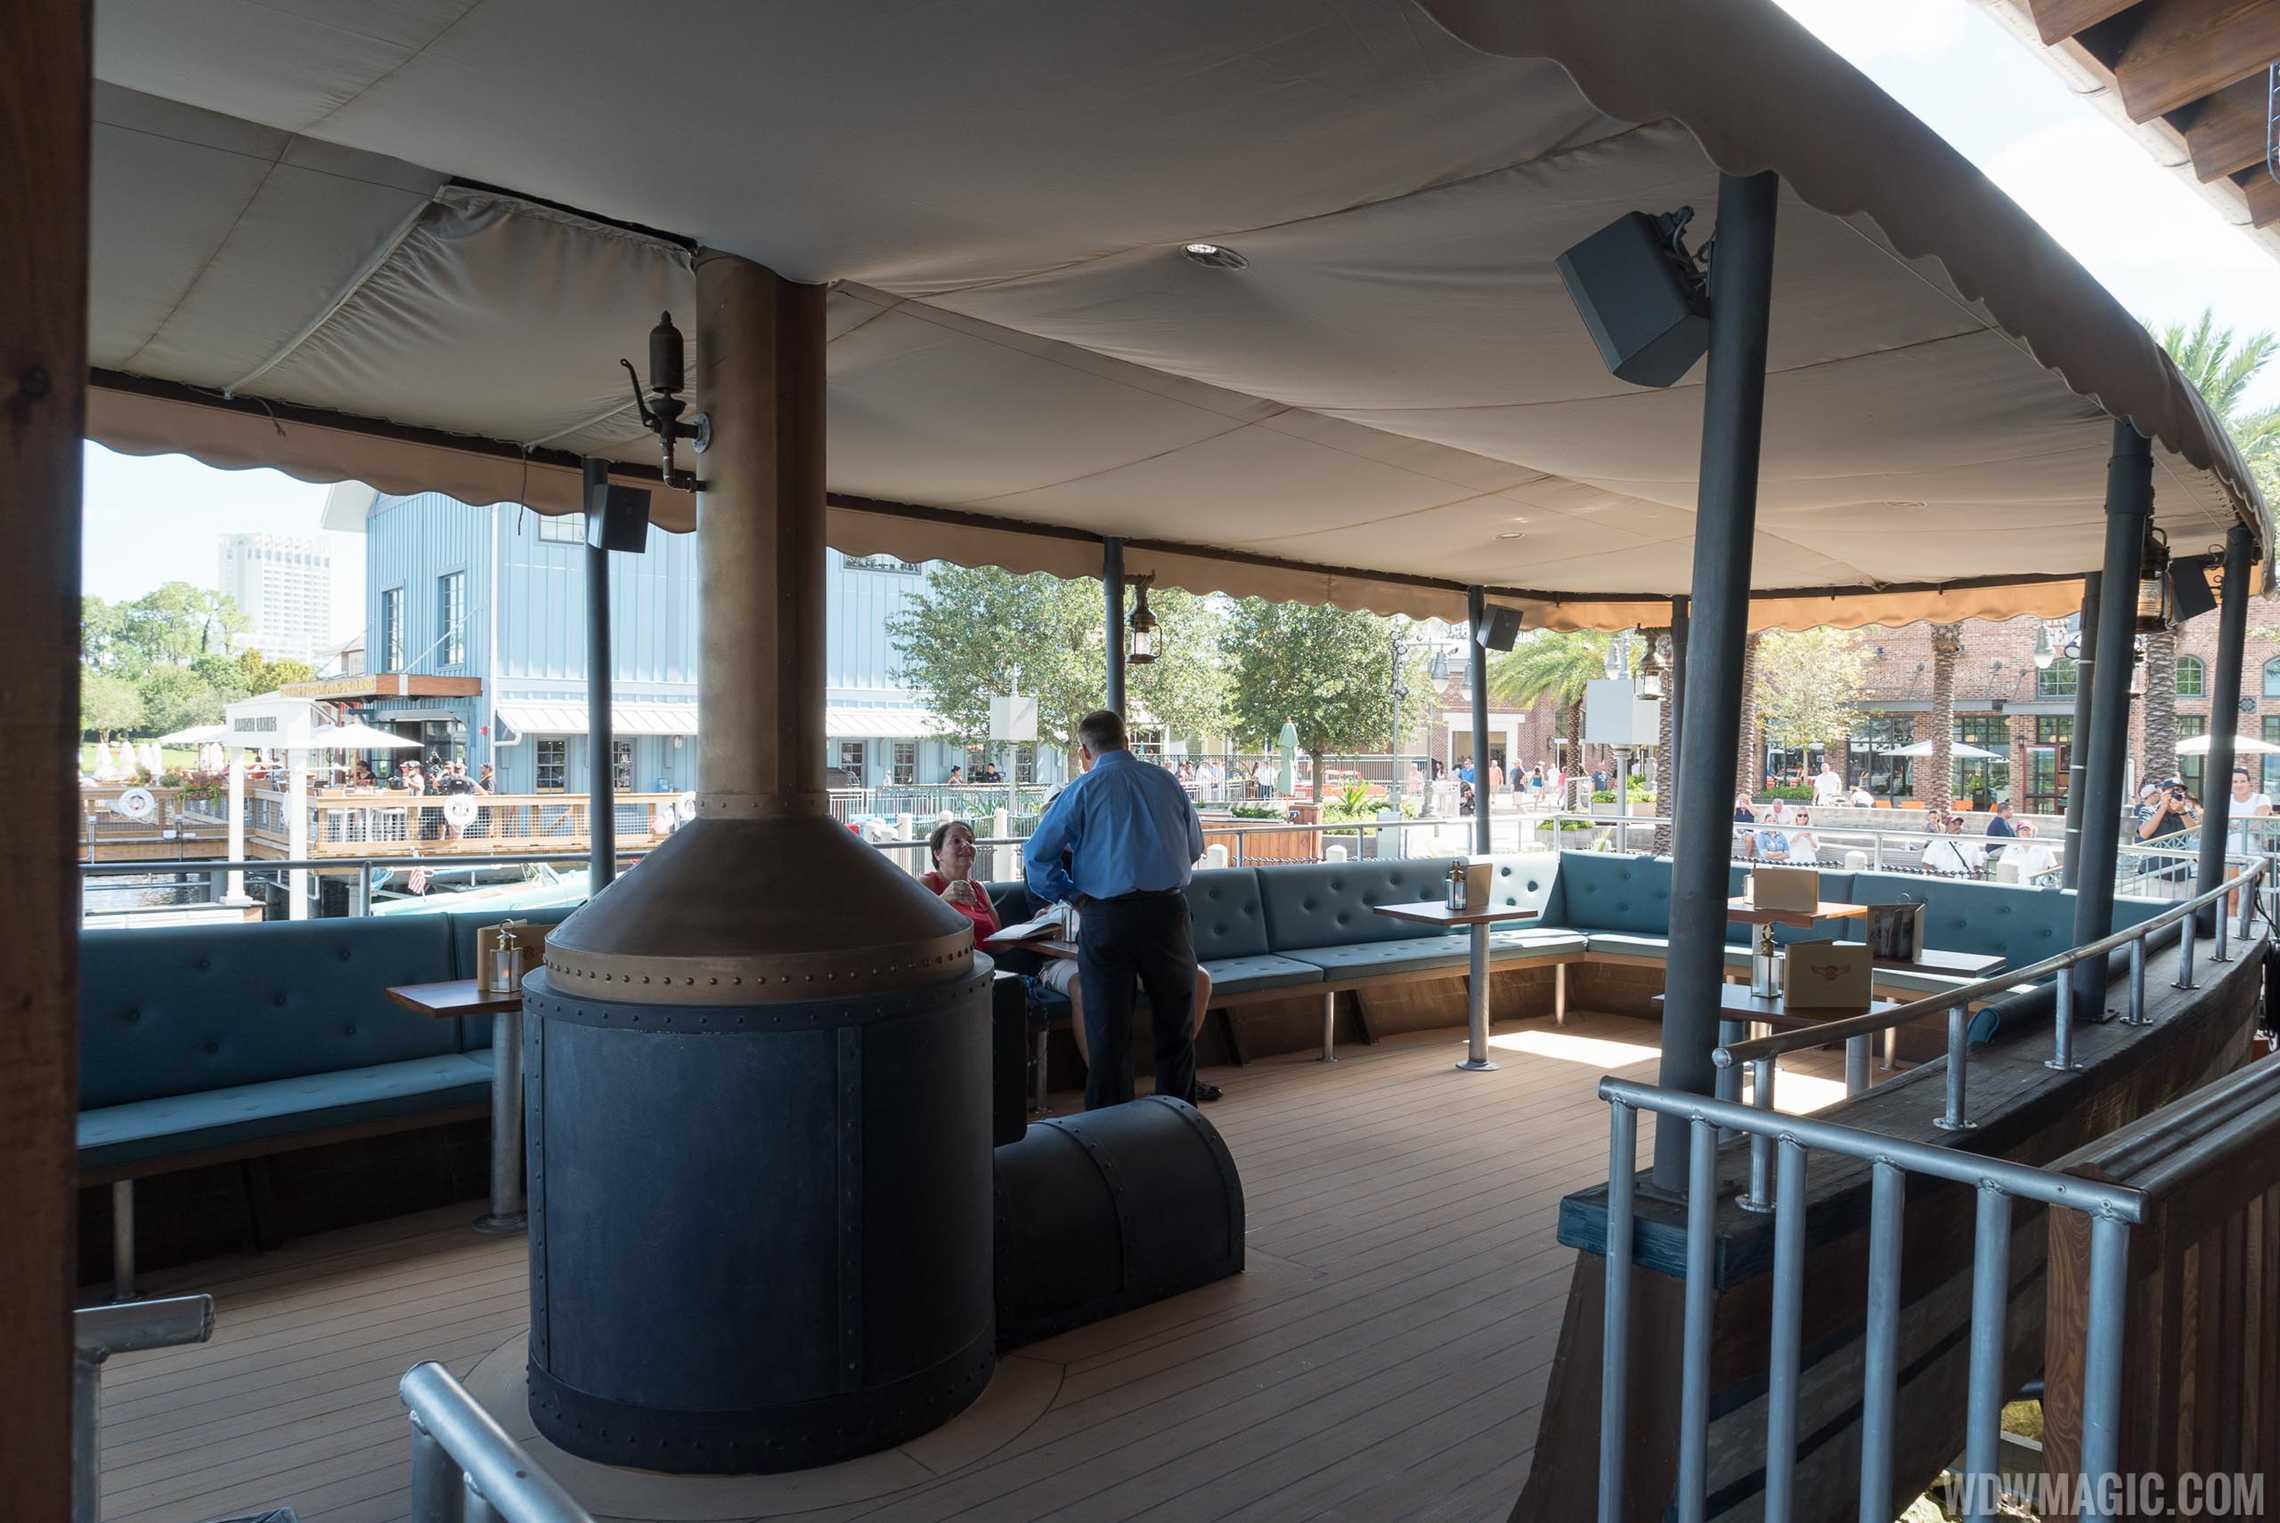 Jock Lindsey's Hangar Bar - Seating on the boat 'Reggie'